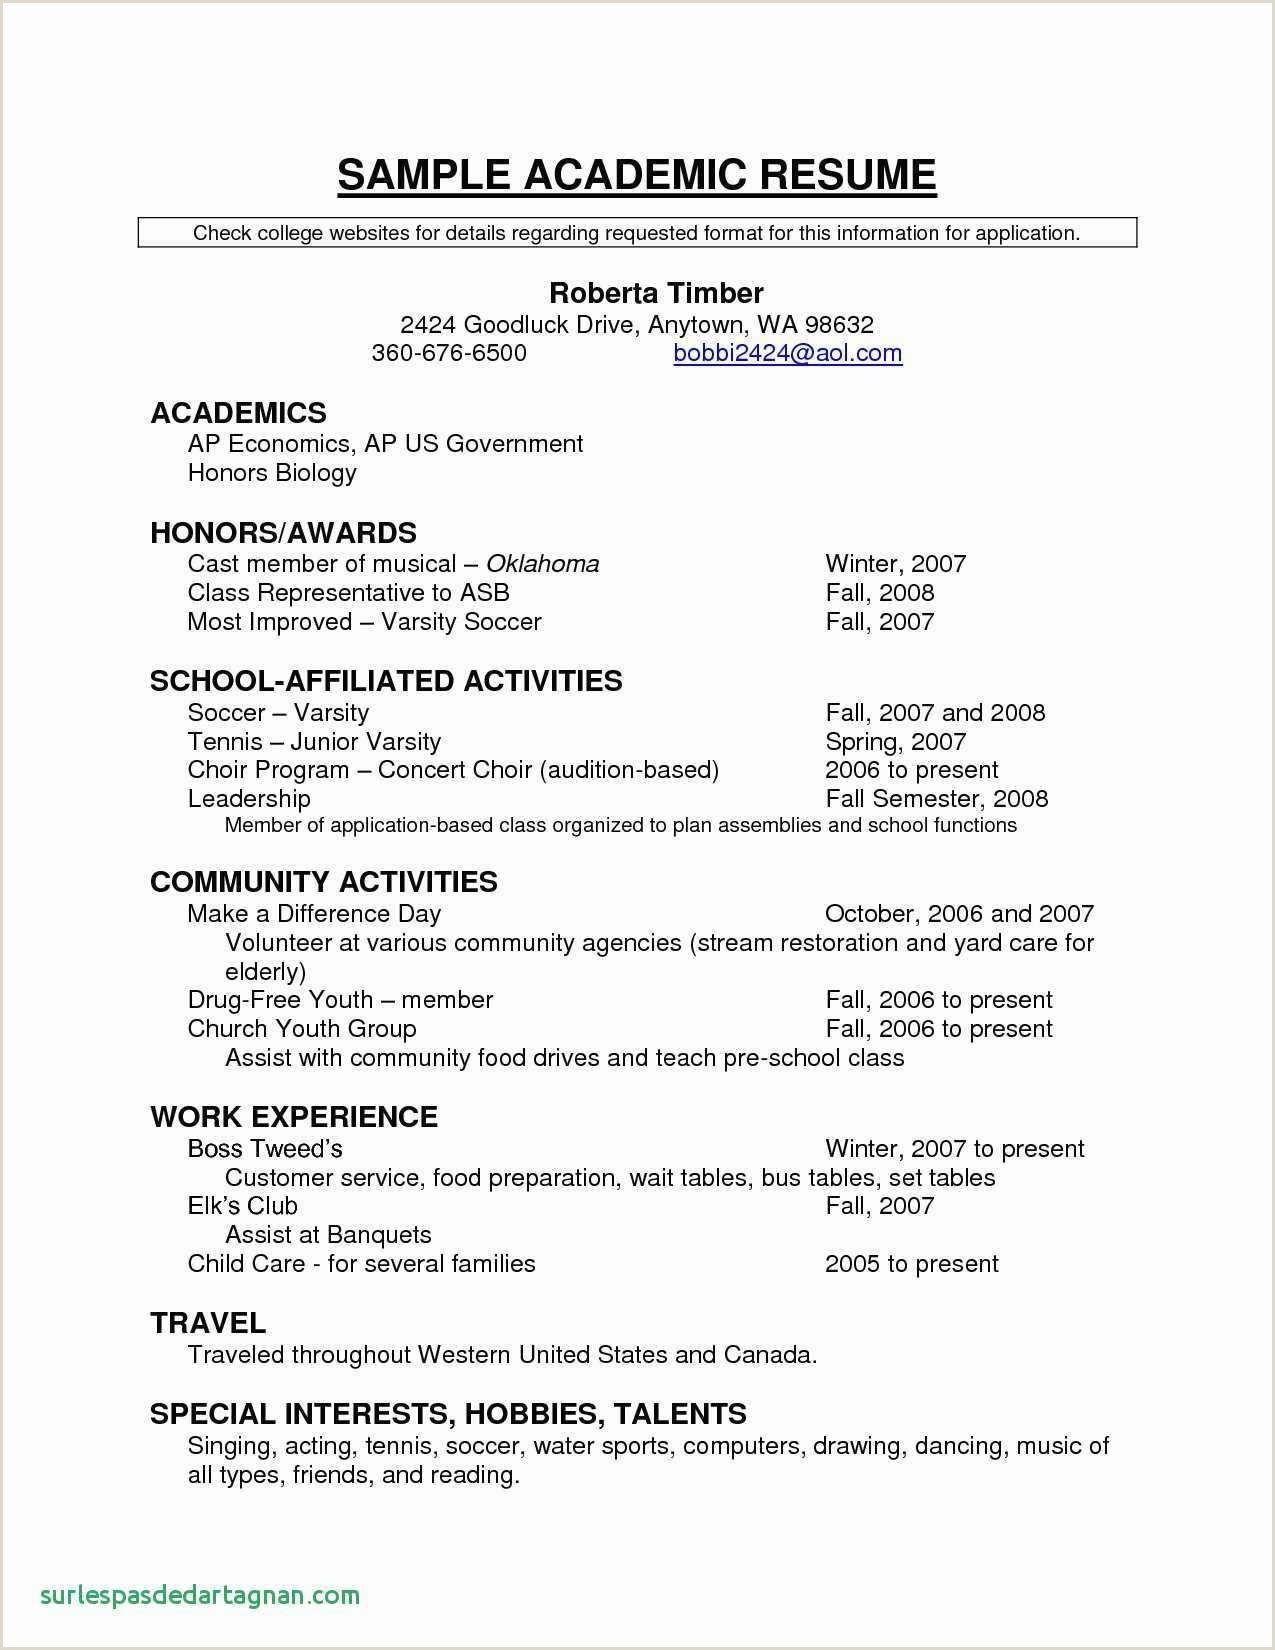 Standard Format Of Cv For Job Application